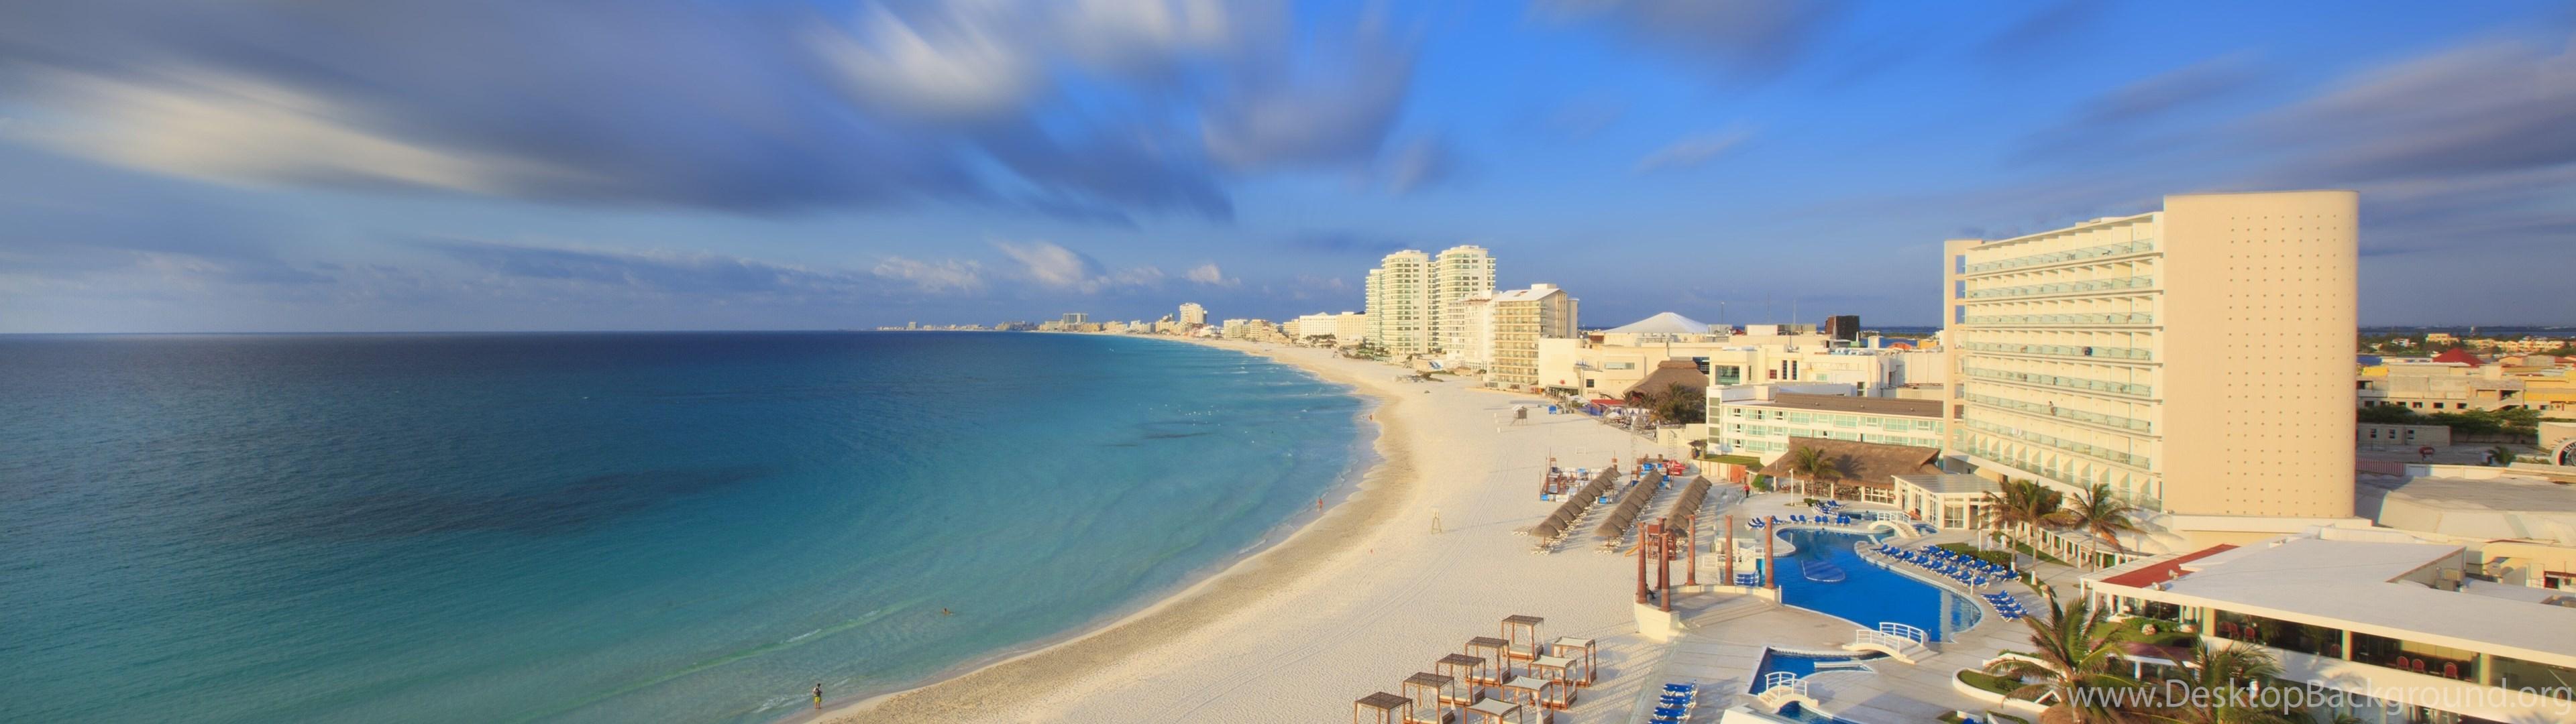 Cancun Wallpaper Travel Beaches Cancun Mexico Best Beaches Desktop Background